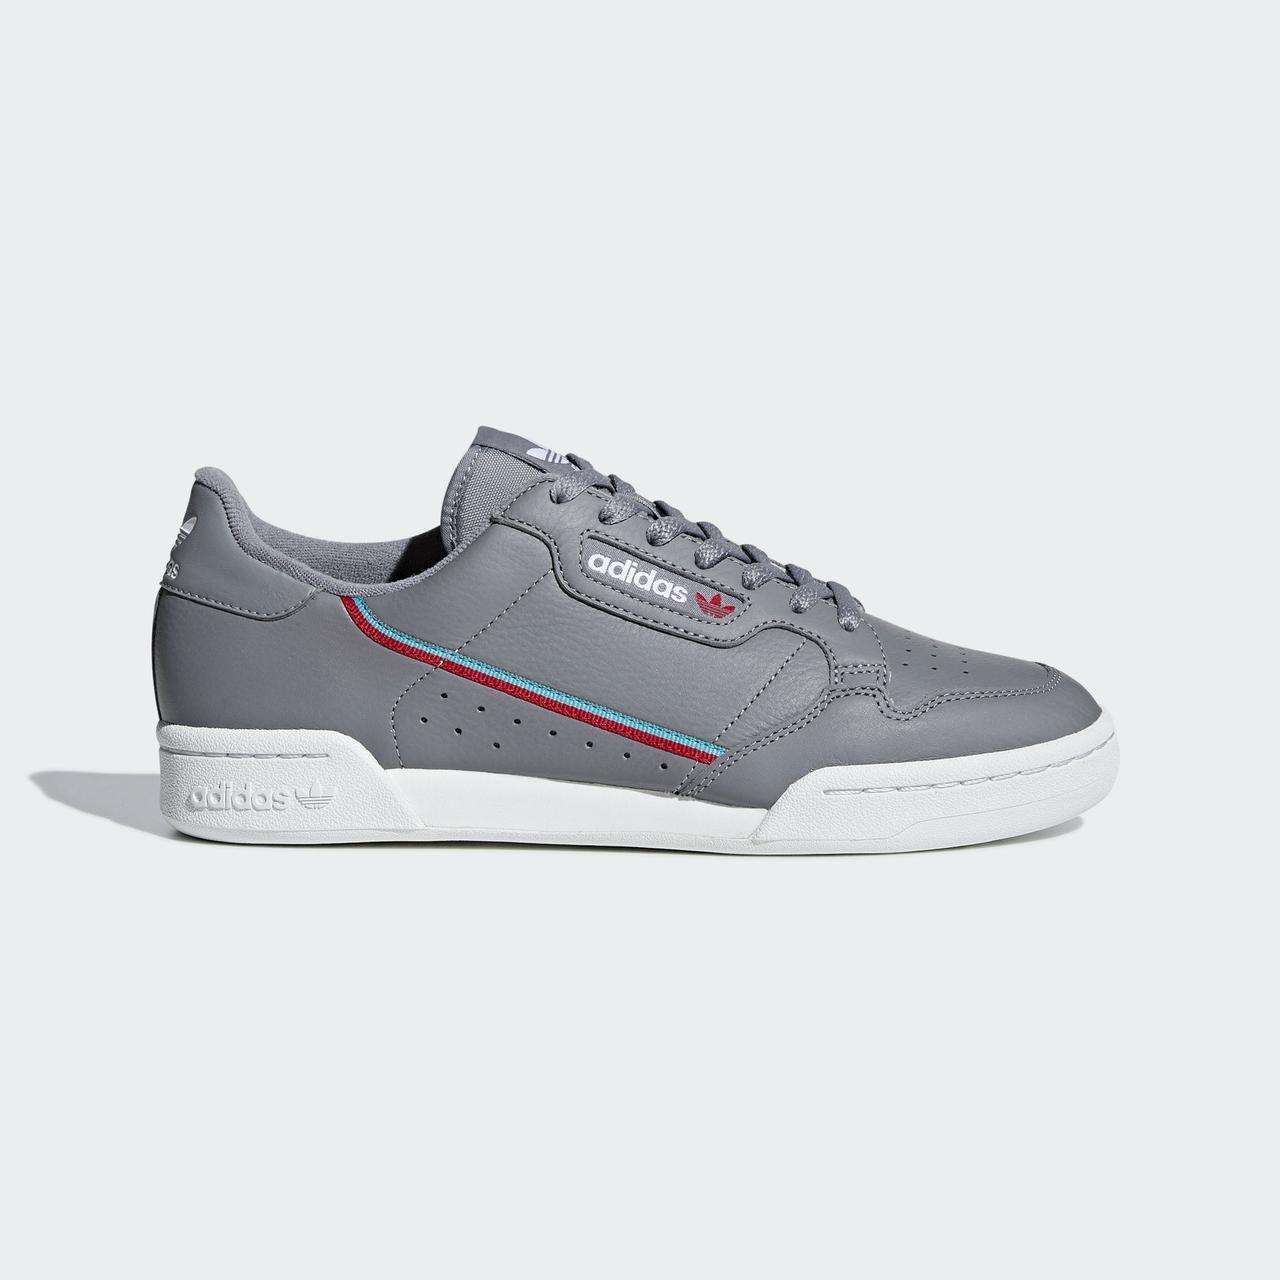 8eca5aa3 Мужские кроссовки Adidas Continental 80 B41671 - 2018/2: продажа ...